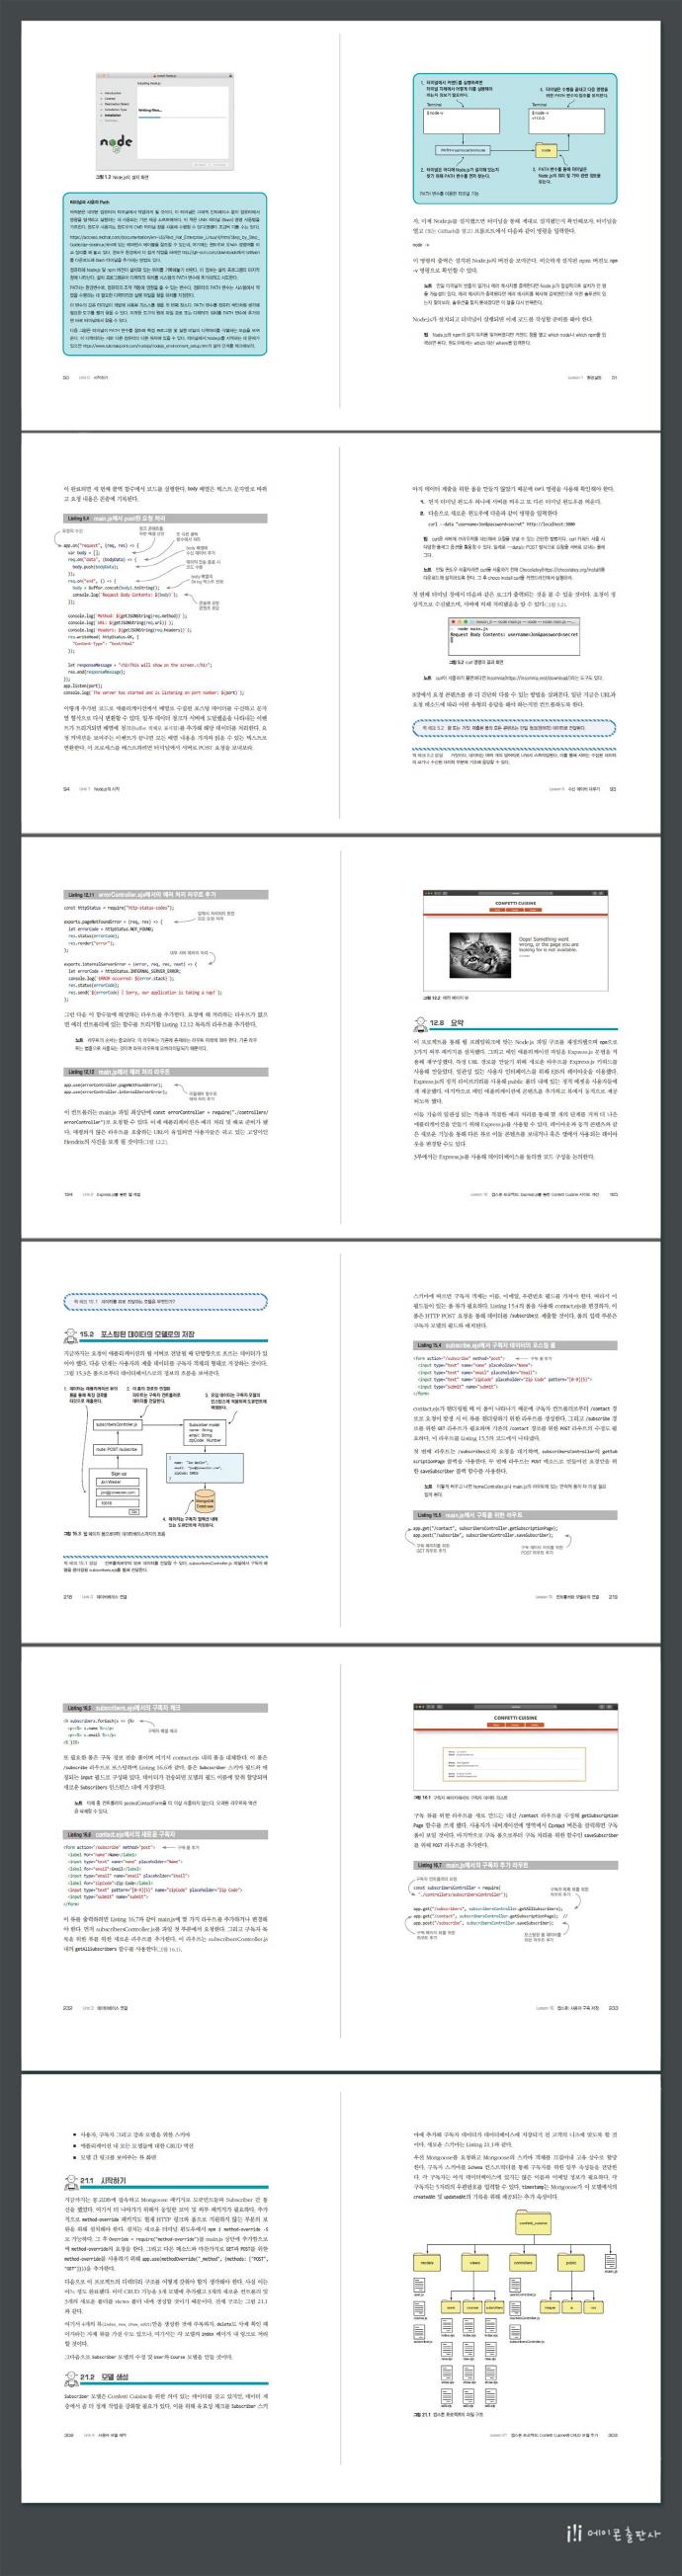 Node.js로 프로그래밍 시작하기 도서 상세이미지